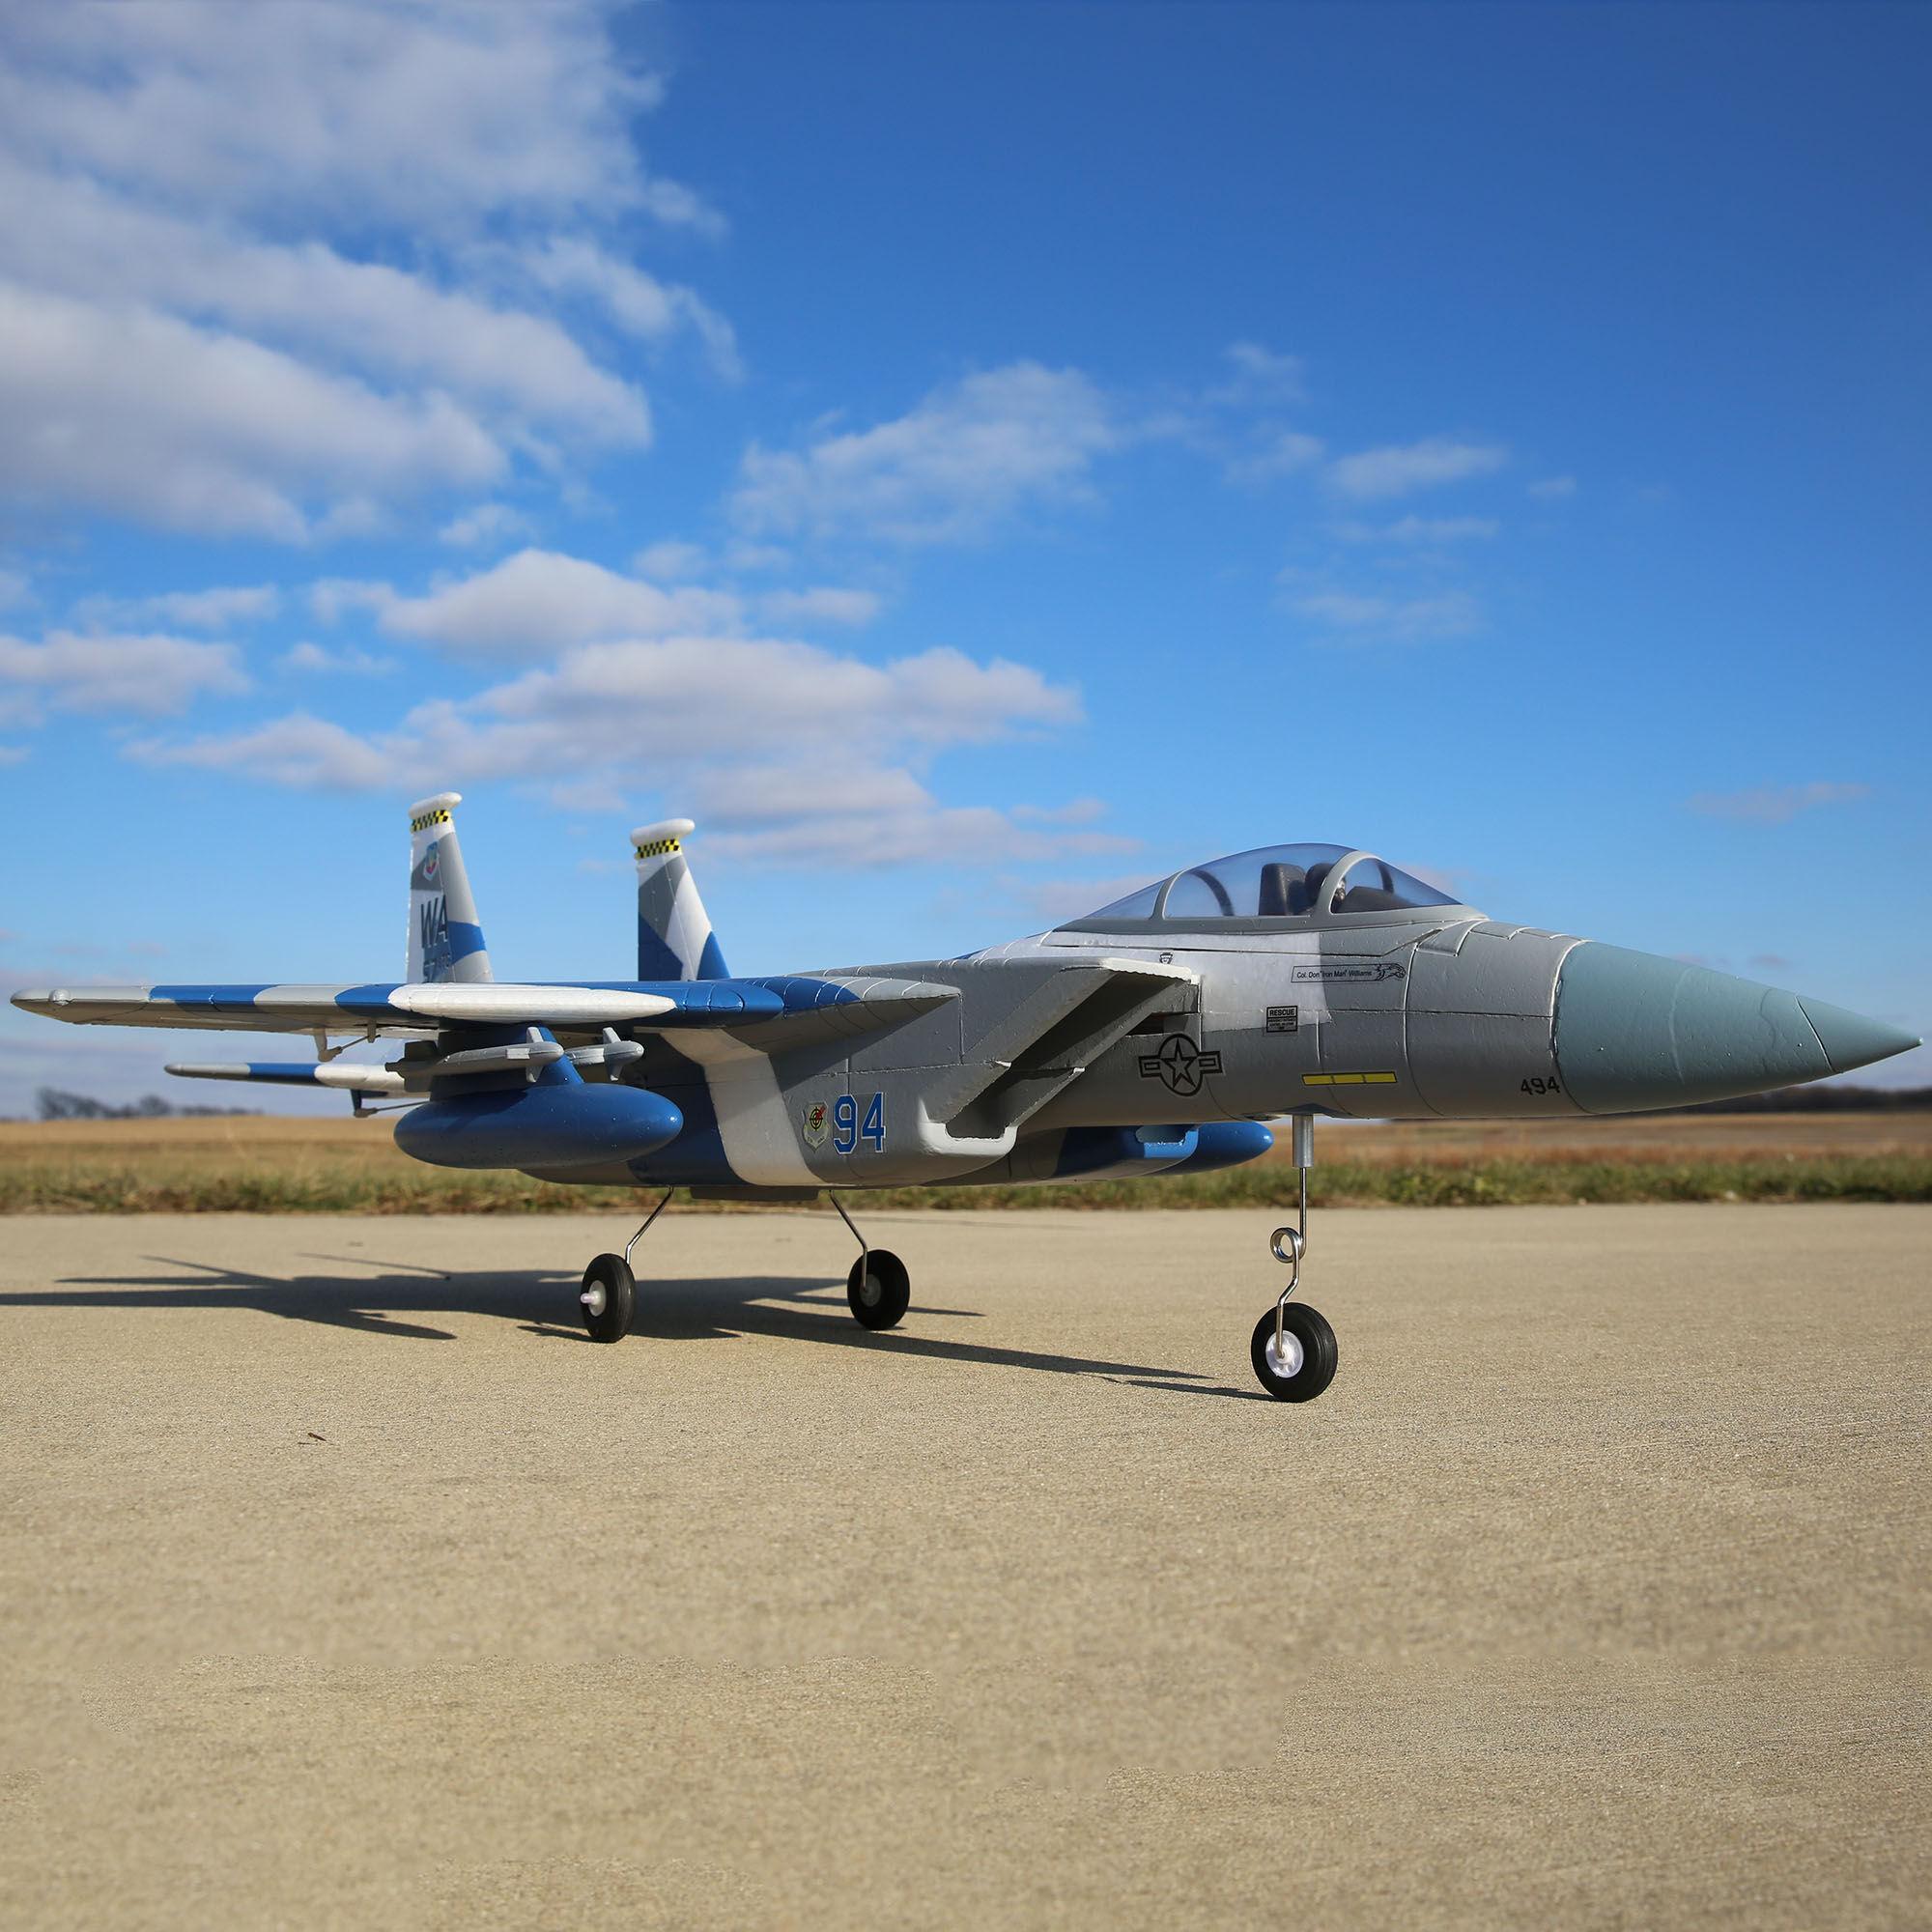 E-Flite pièce de rechange Wing Set f-15 Eagle 64 mm EDF//efl9777